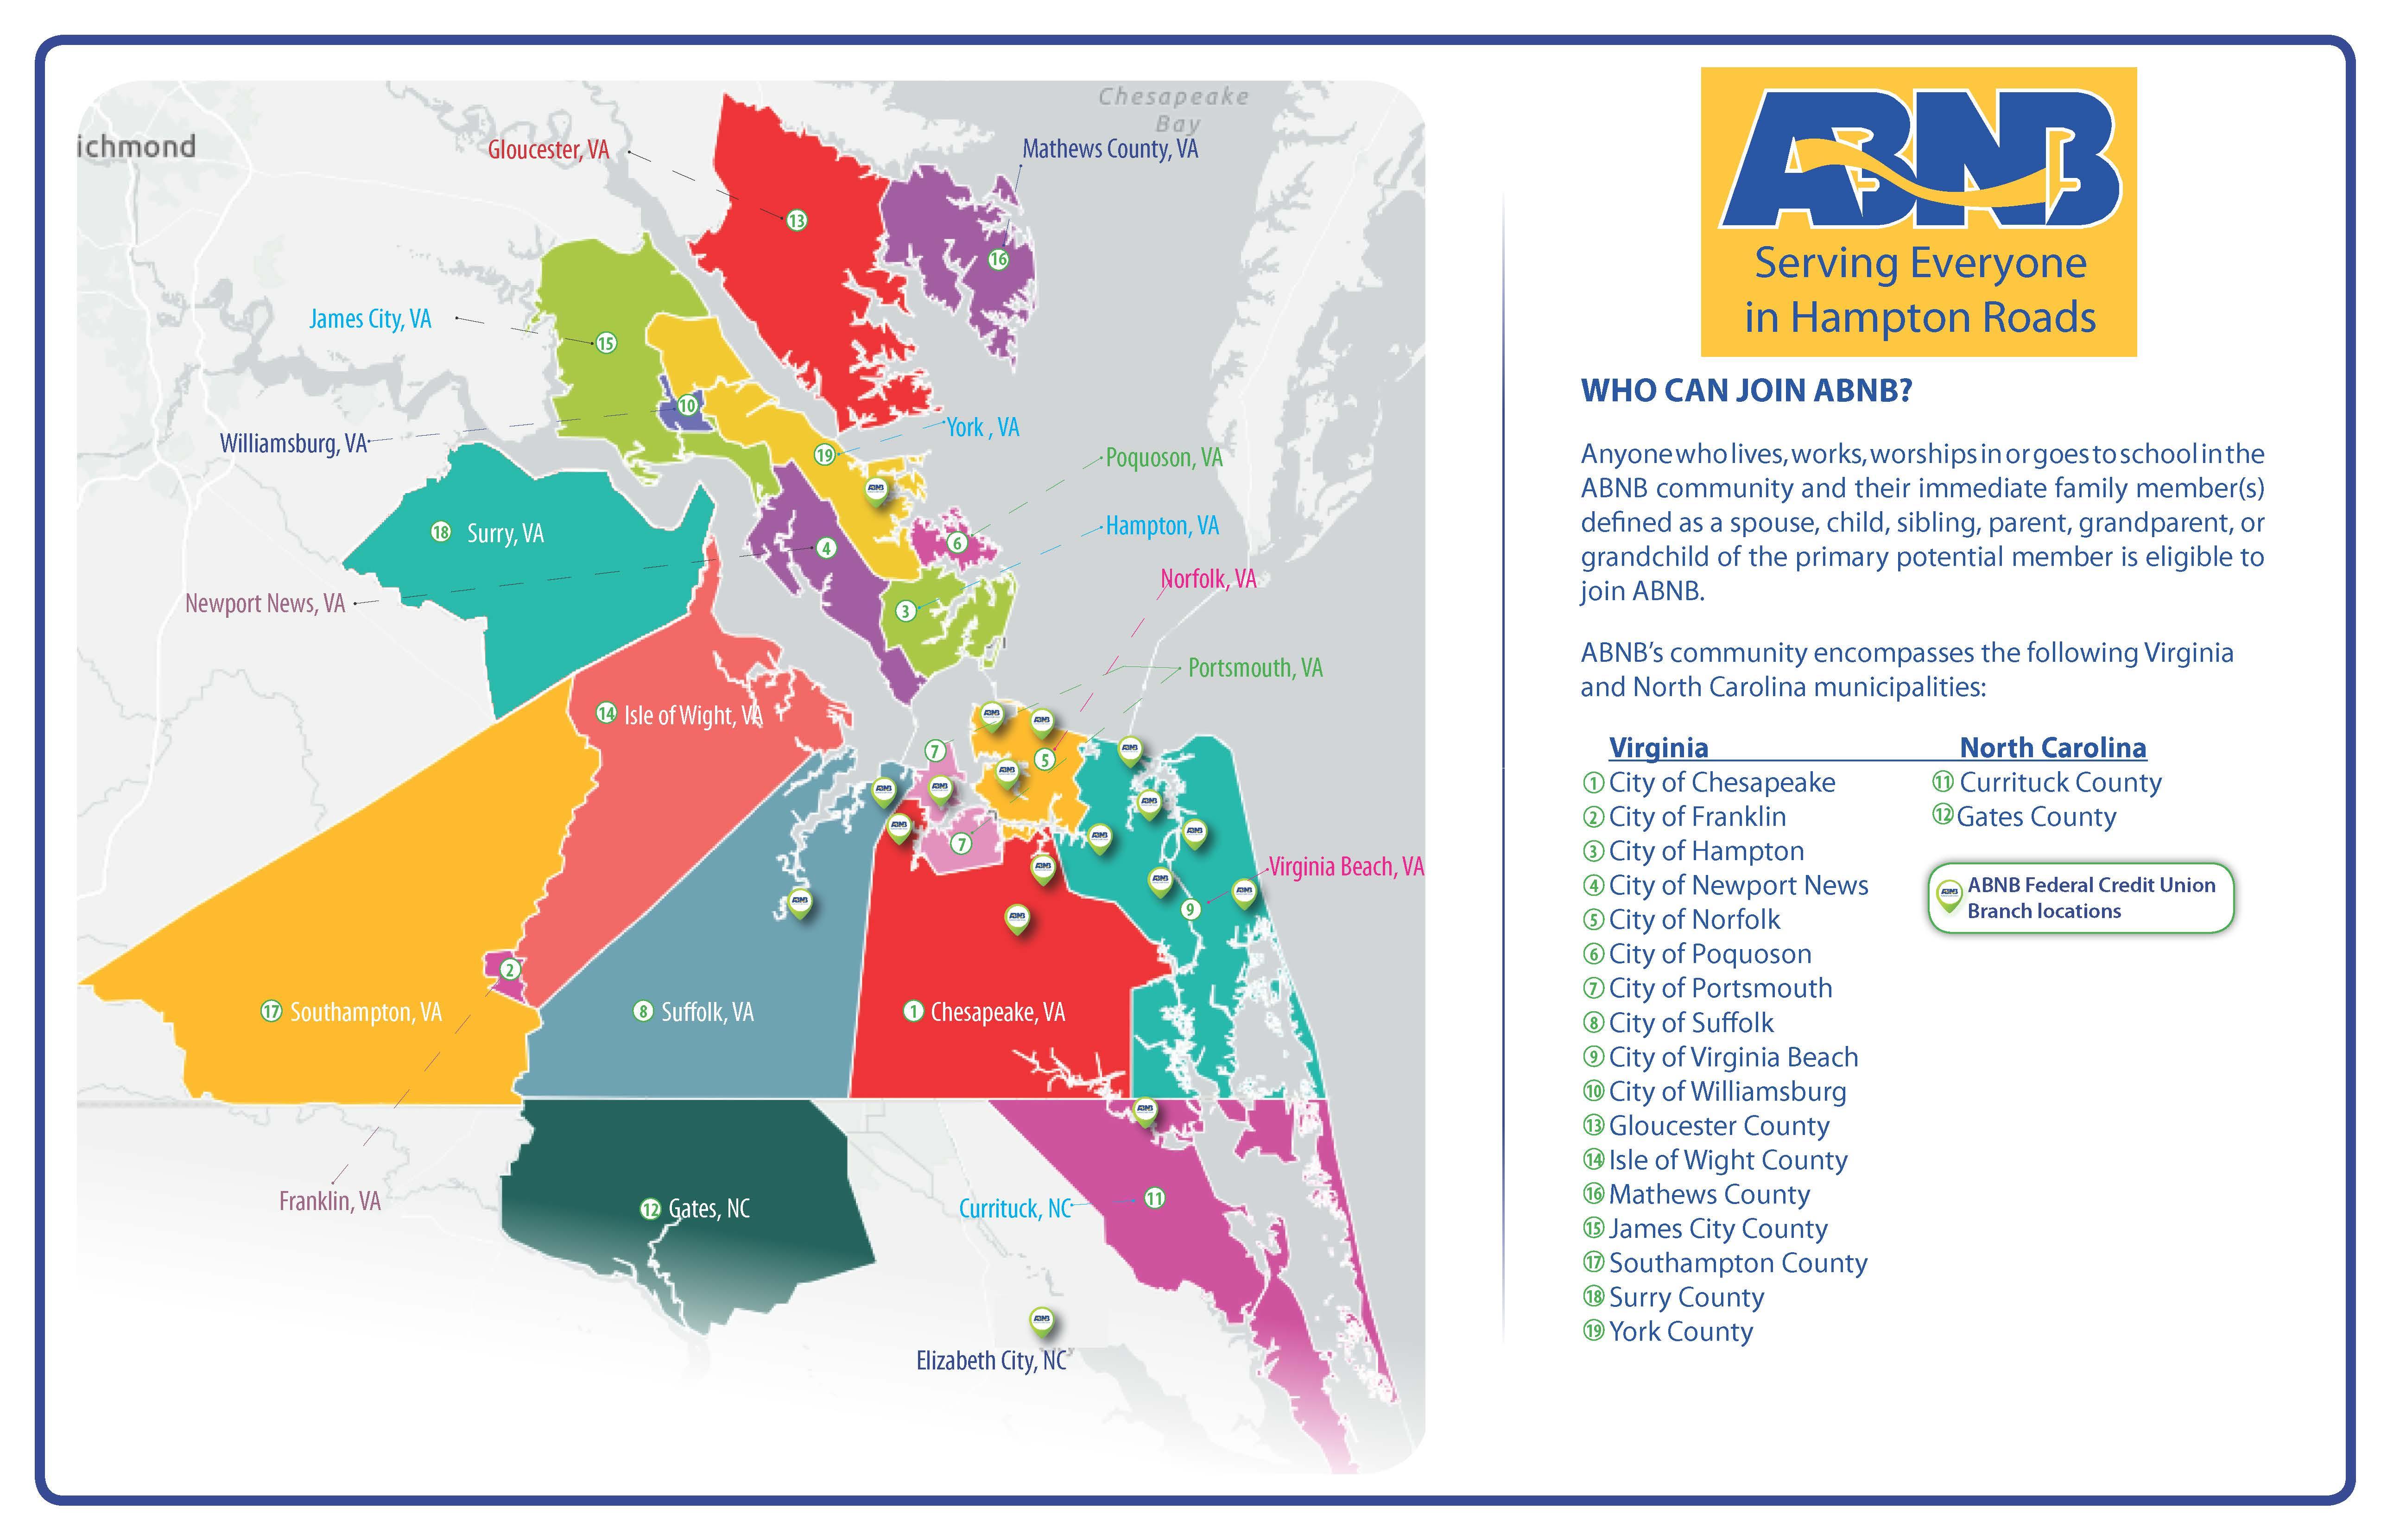 About ABNB | ABNB FCU | Virginia Beach, VA - Chesapeake ...